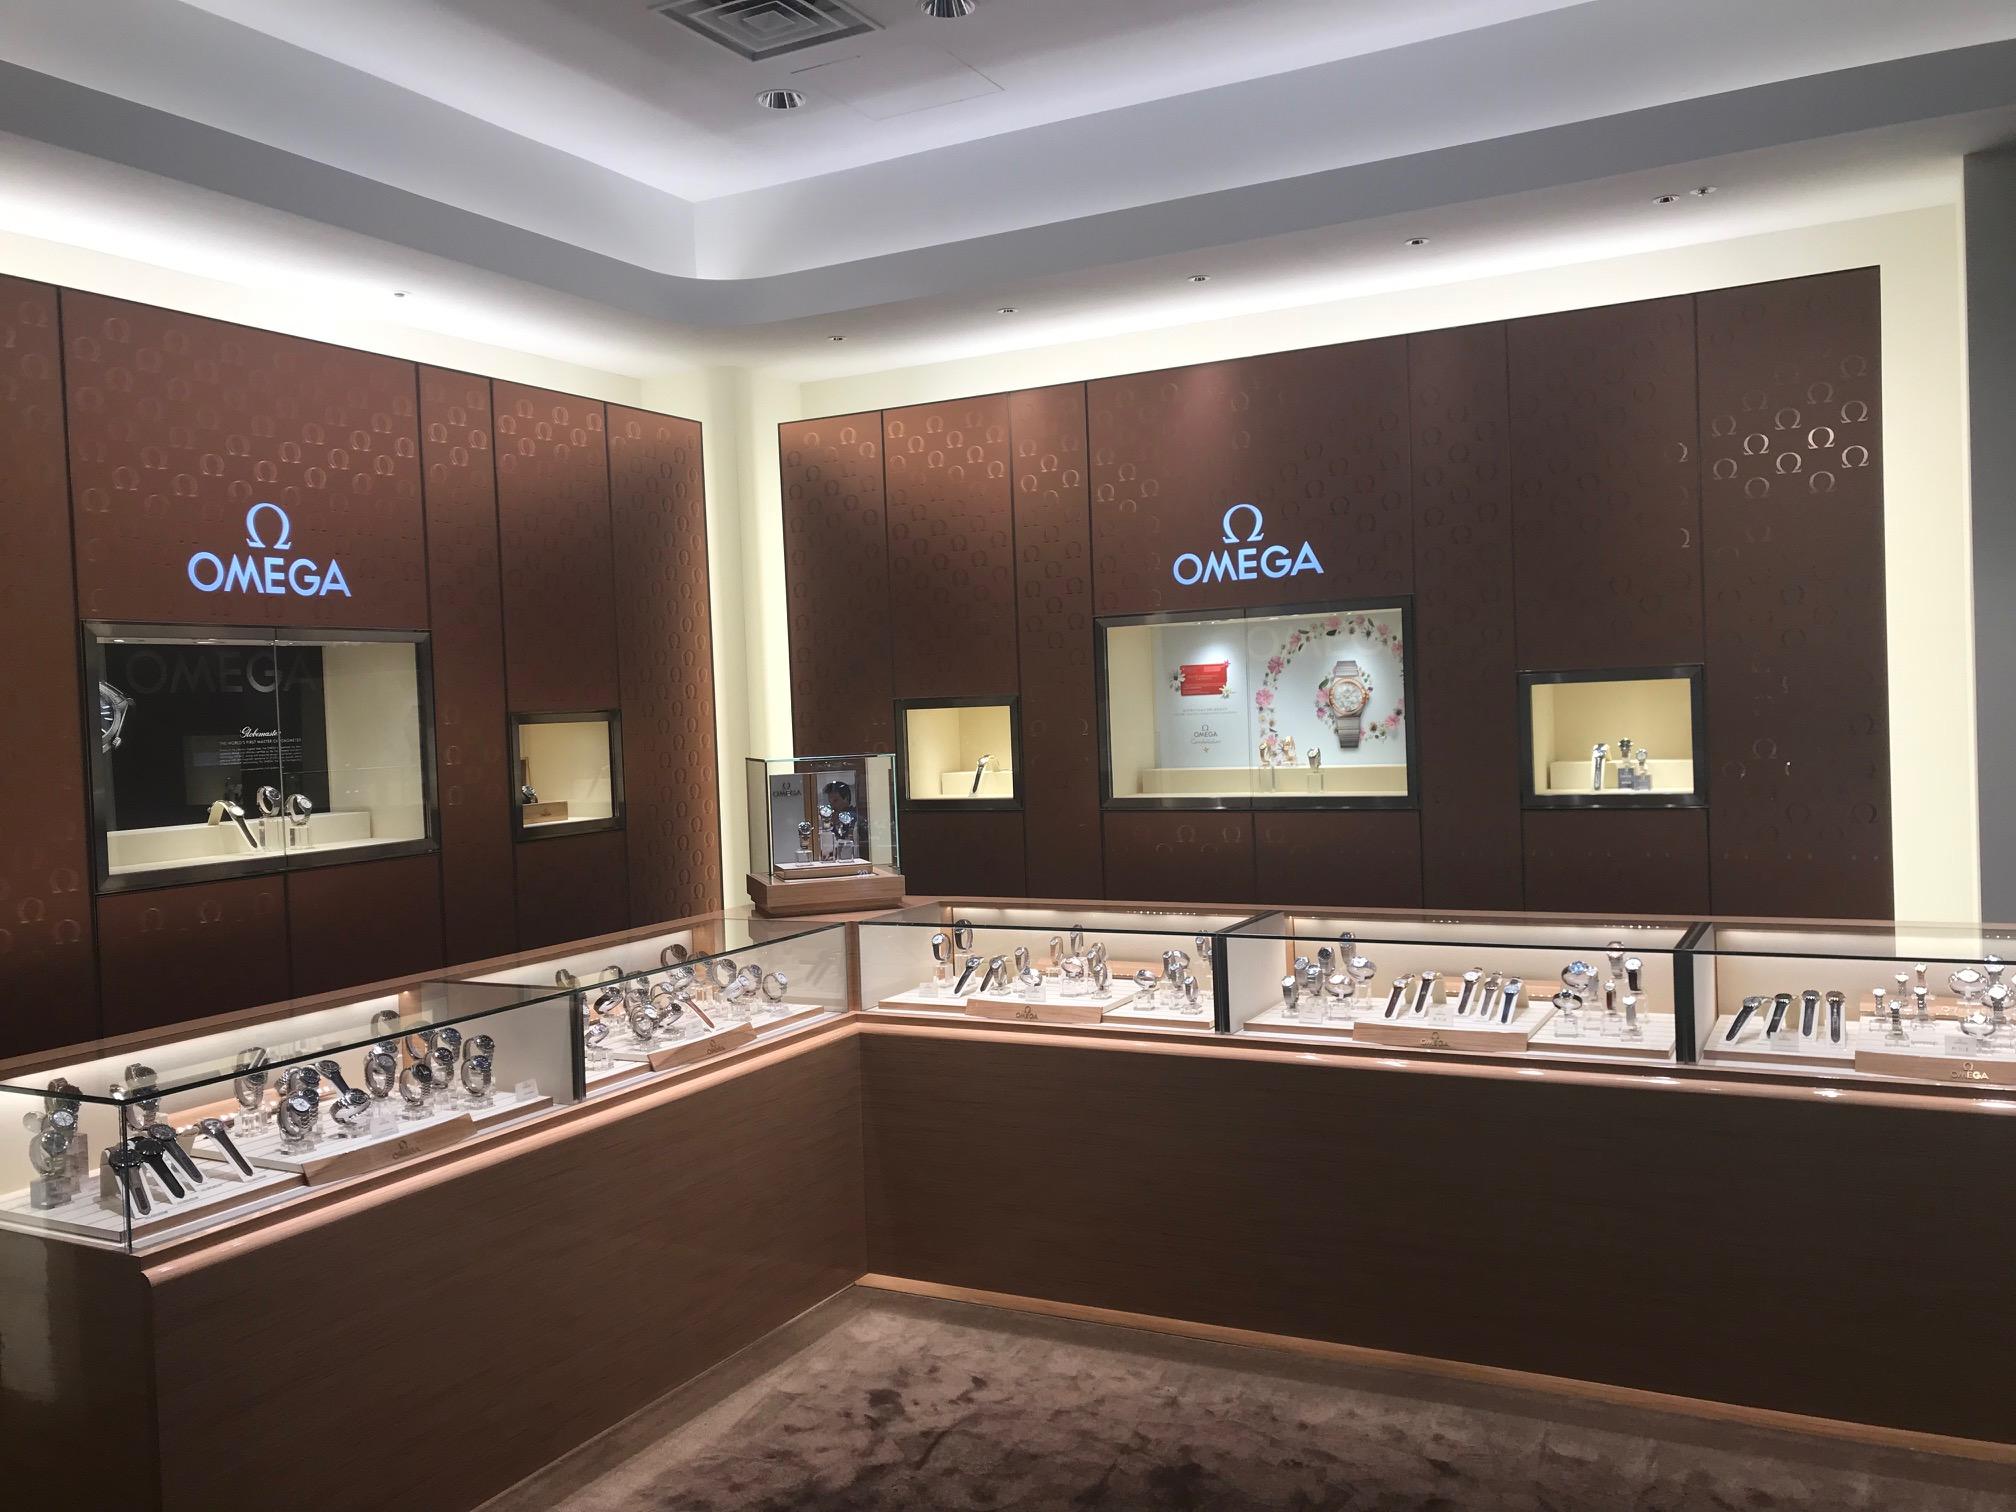 buy popular d3704 4b043 山形屋ウォッチギャラリー | ブランド腕時計の正規販売店紹介 ...